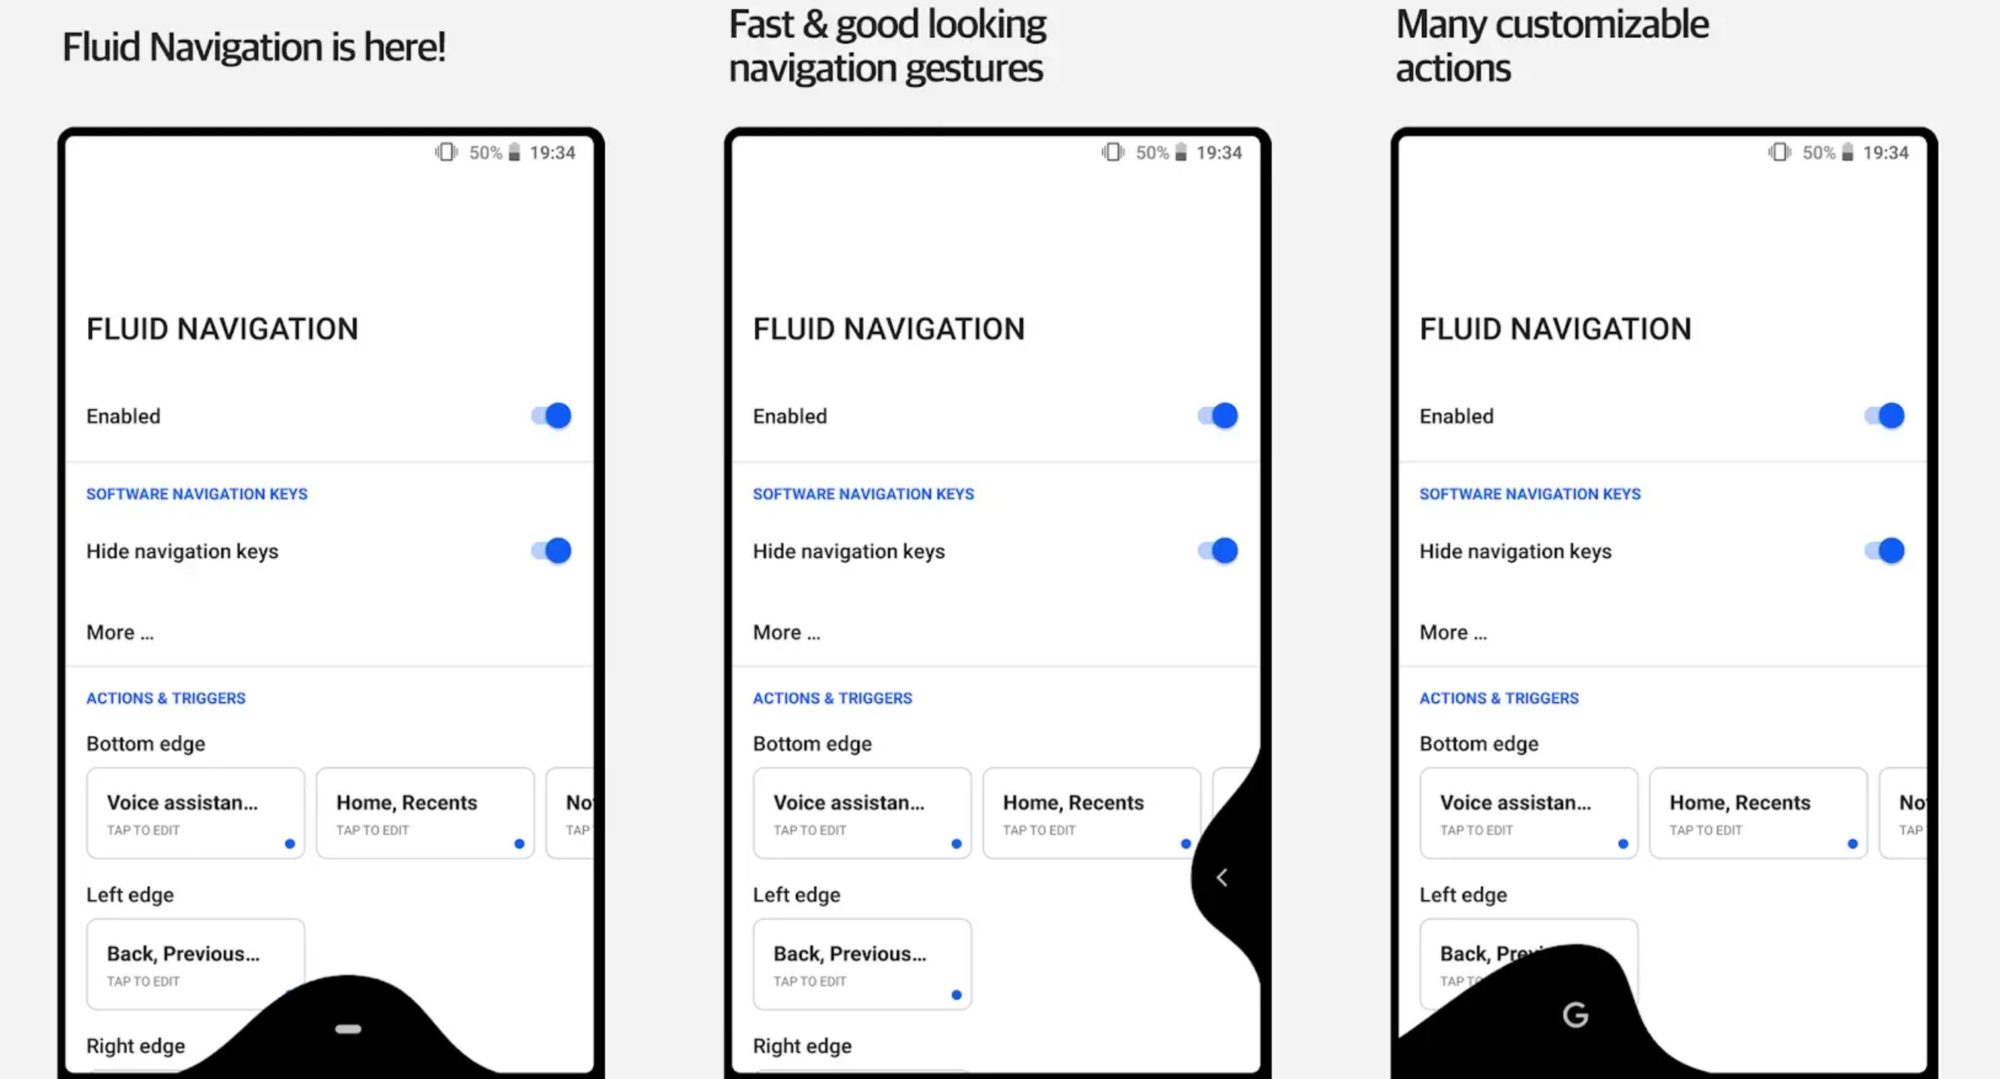 Fluid-Navigation-Gestures-e1541846437974